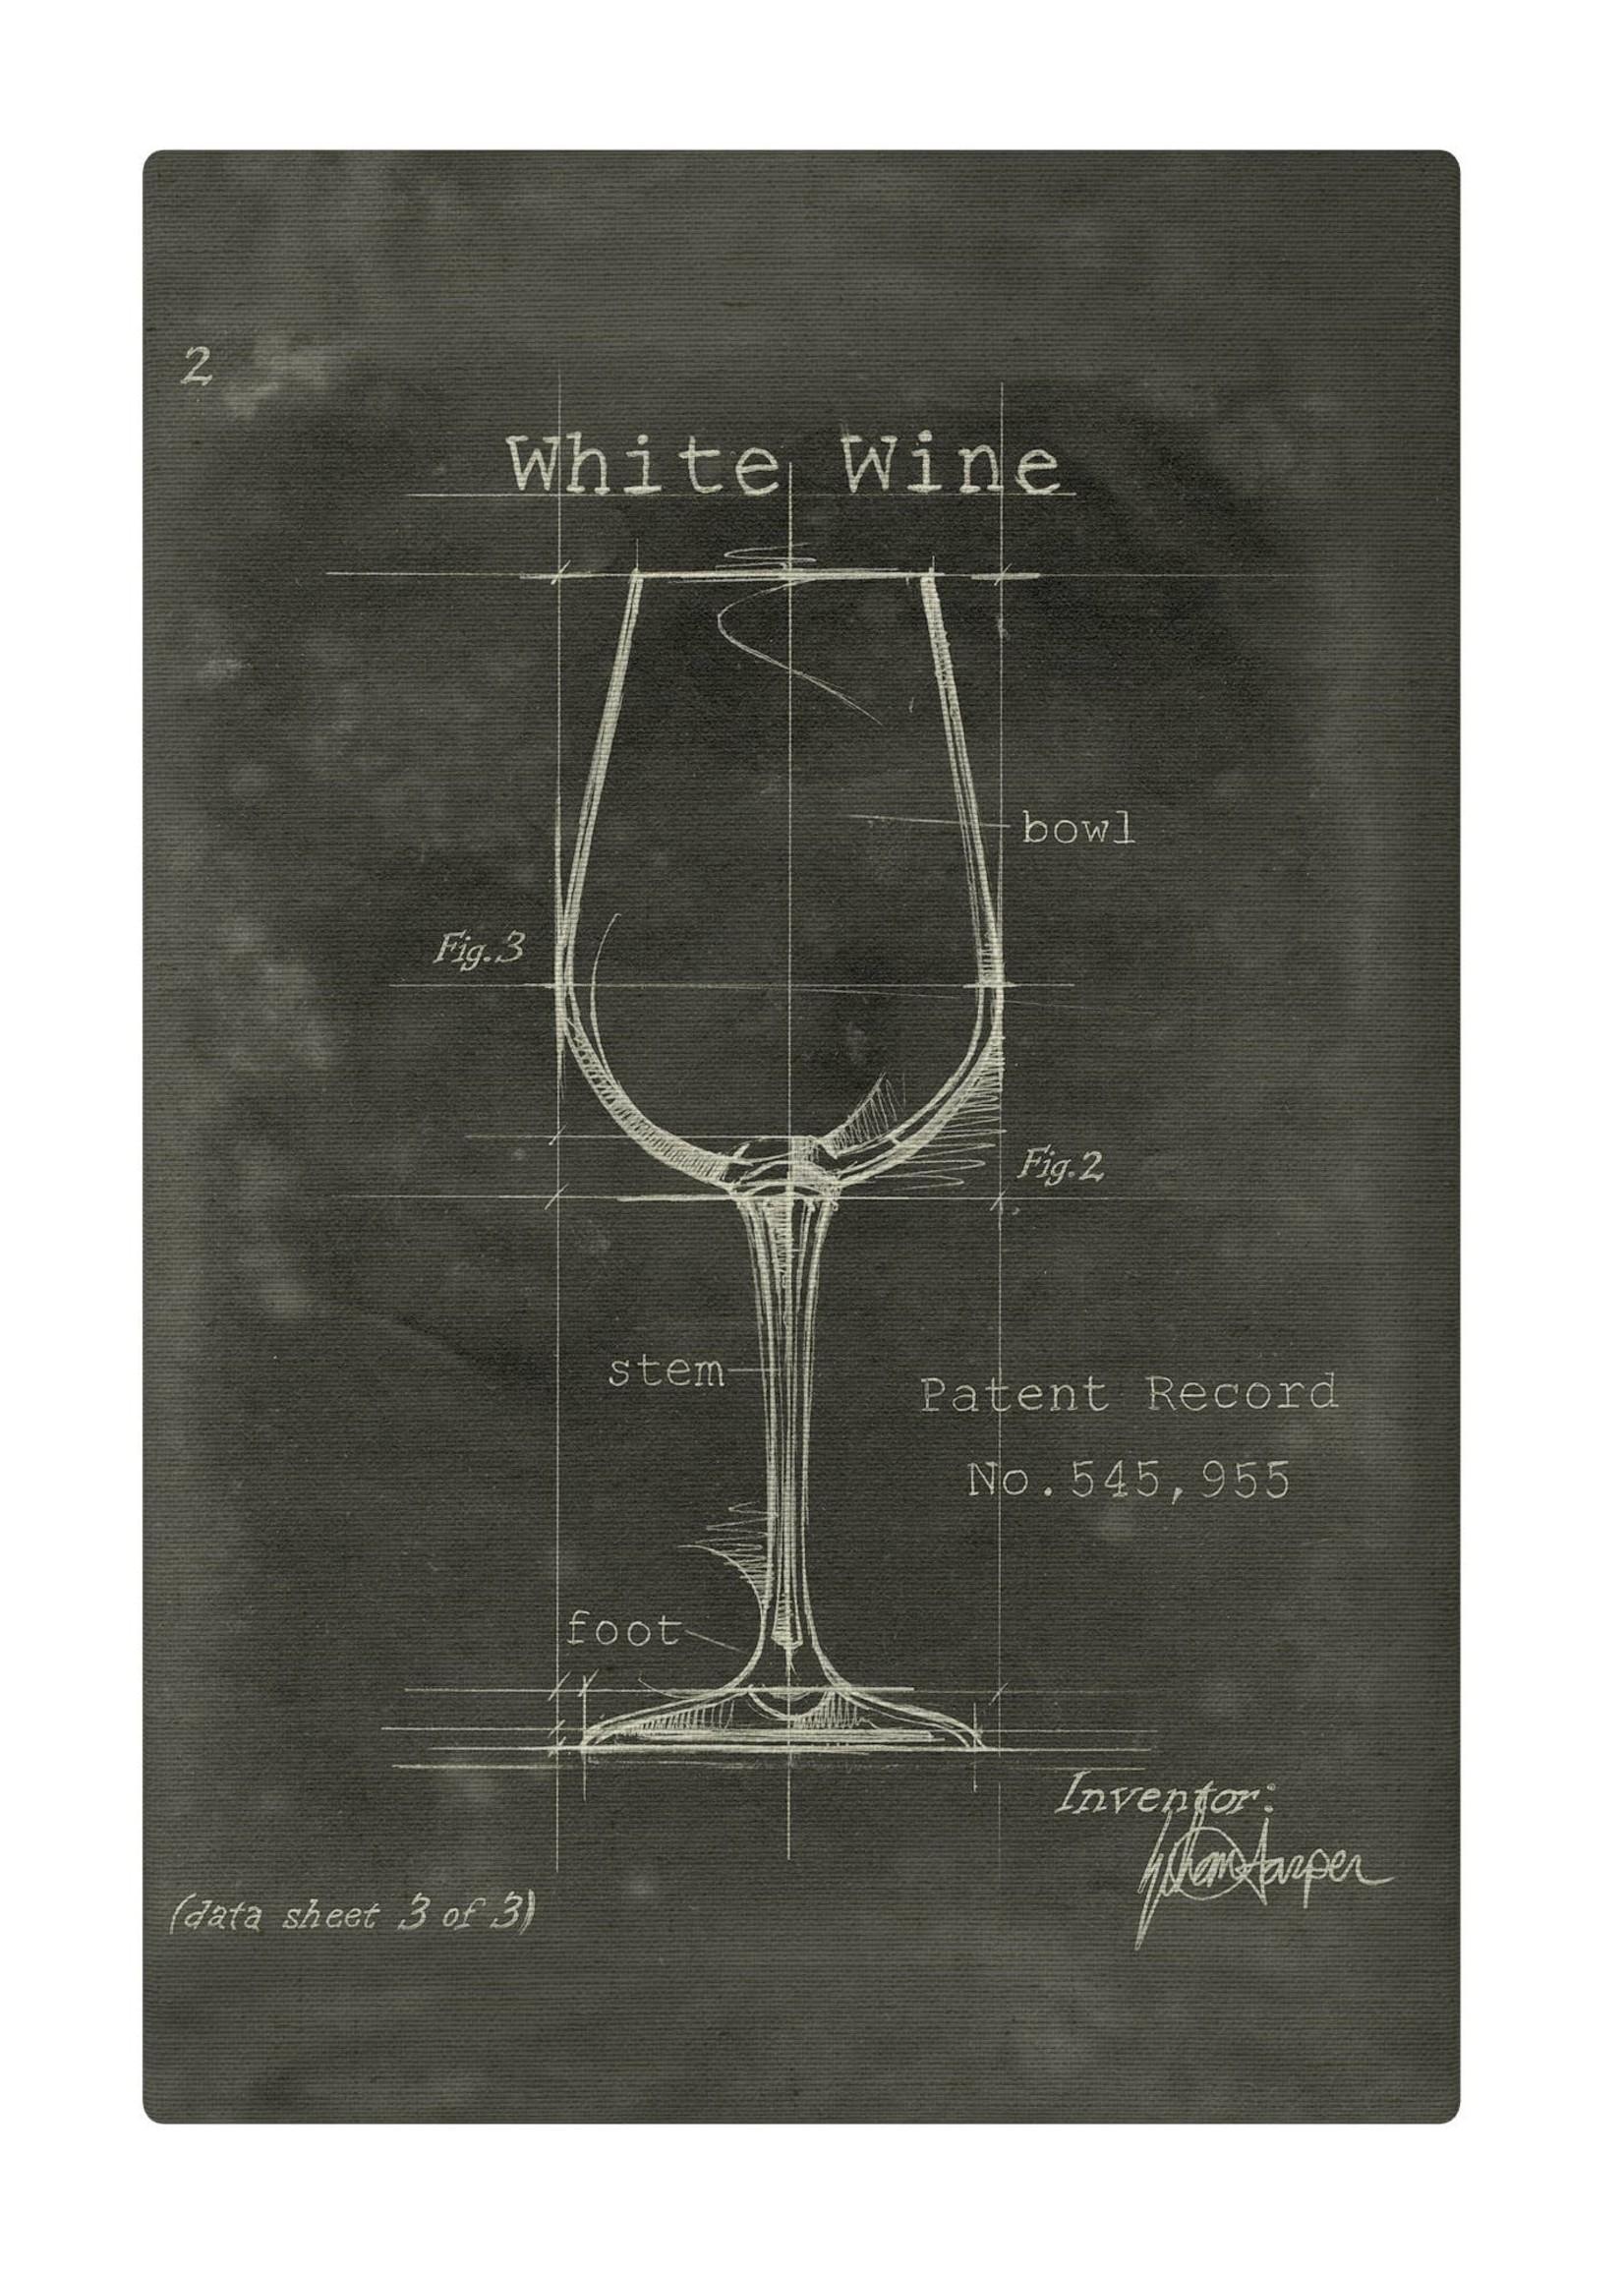 Barware White Wine Fabric Gallery Wrapped Wall Art 20x24